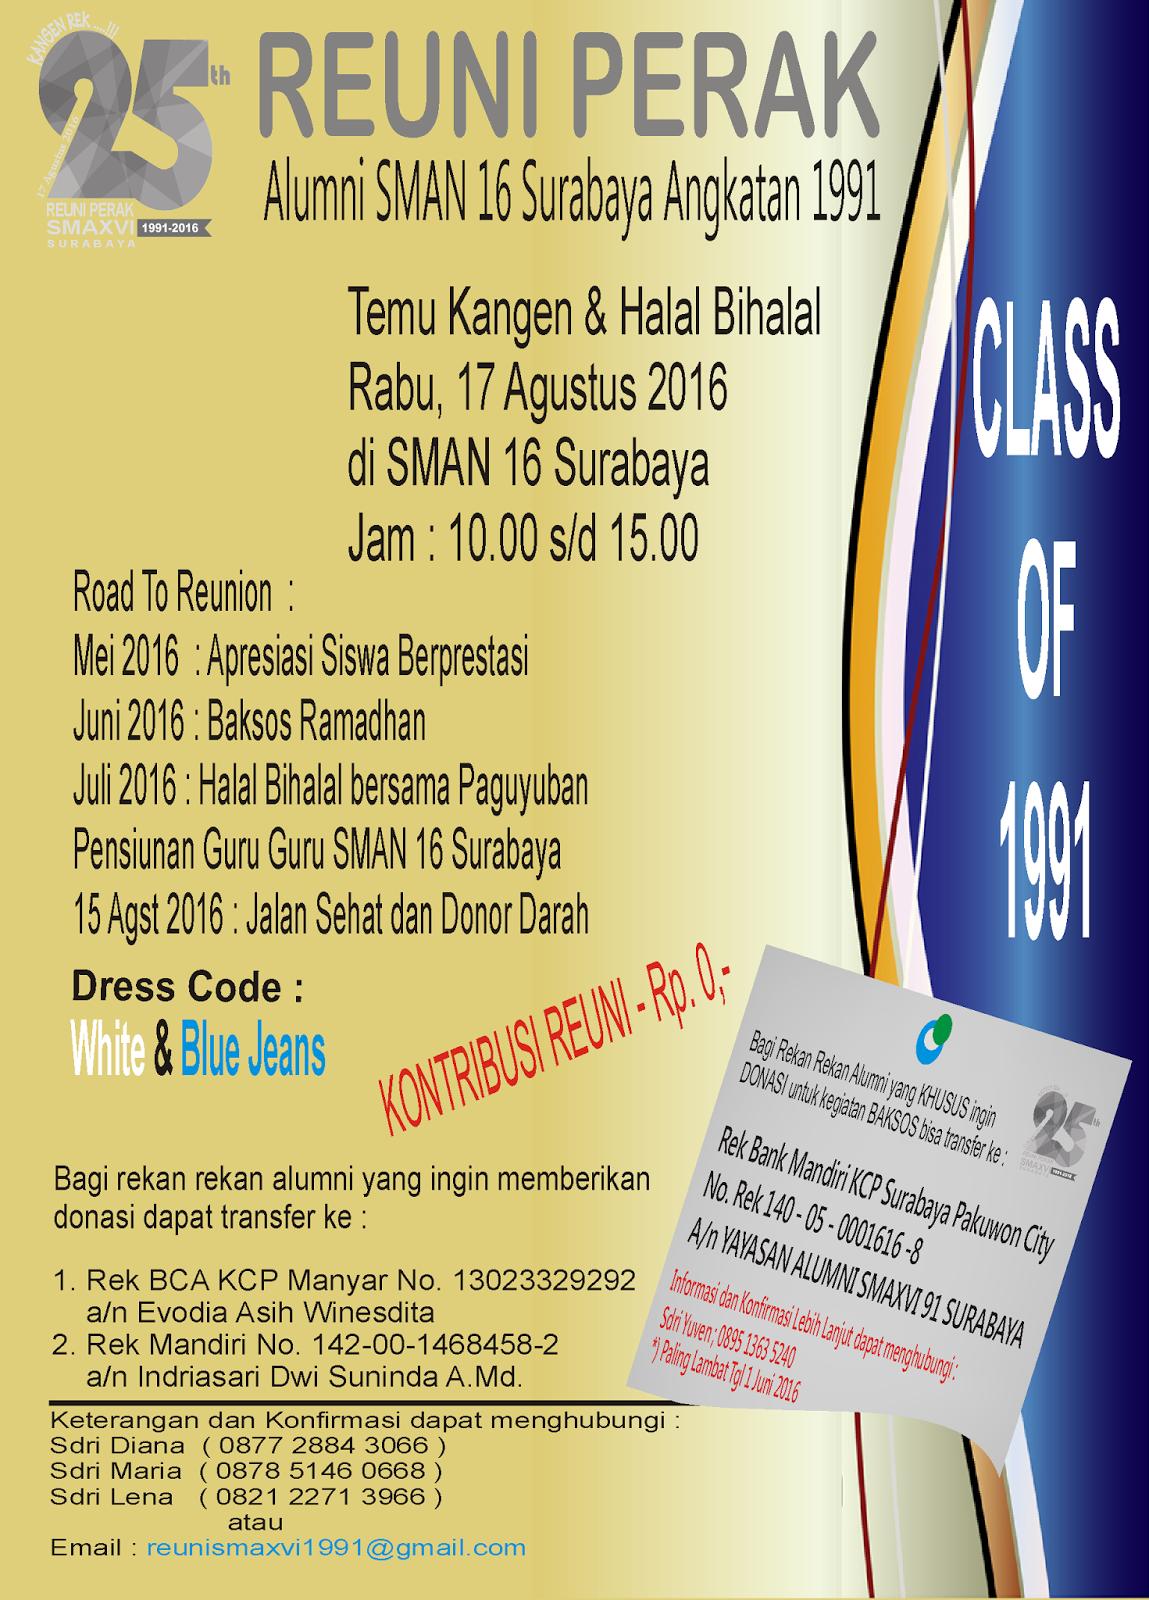 Alumni Smaxvi Surabaya 1991 Kangen Rek